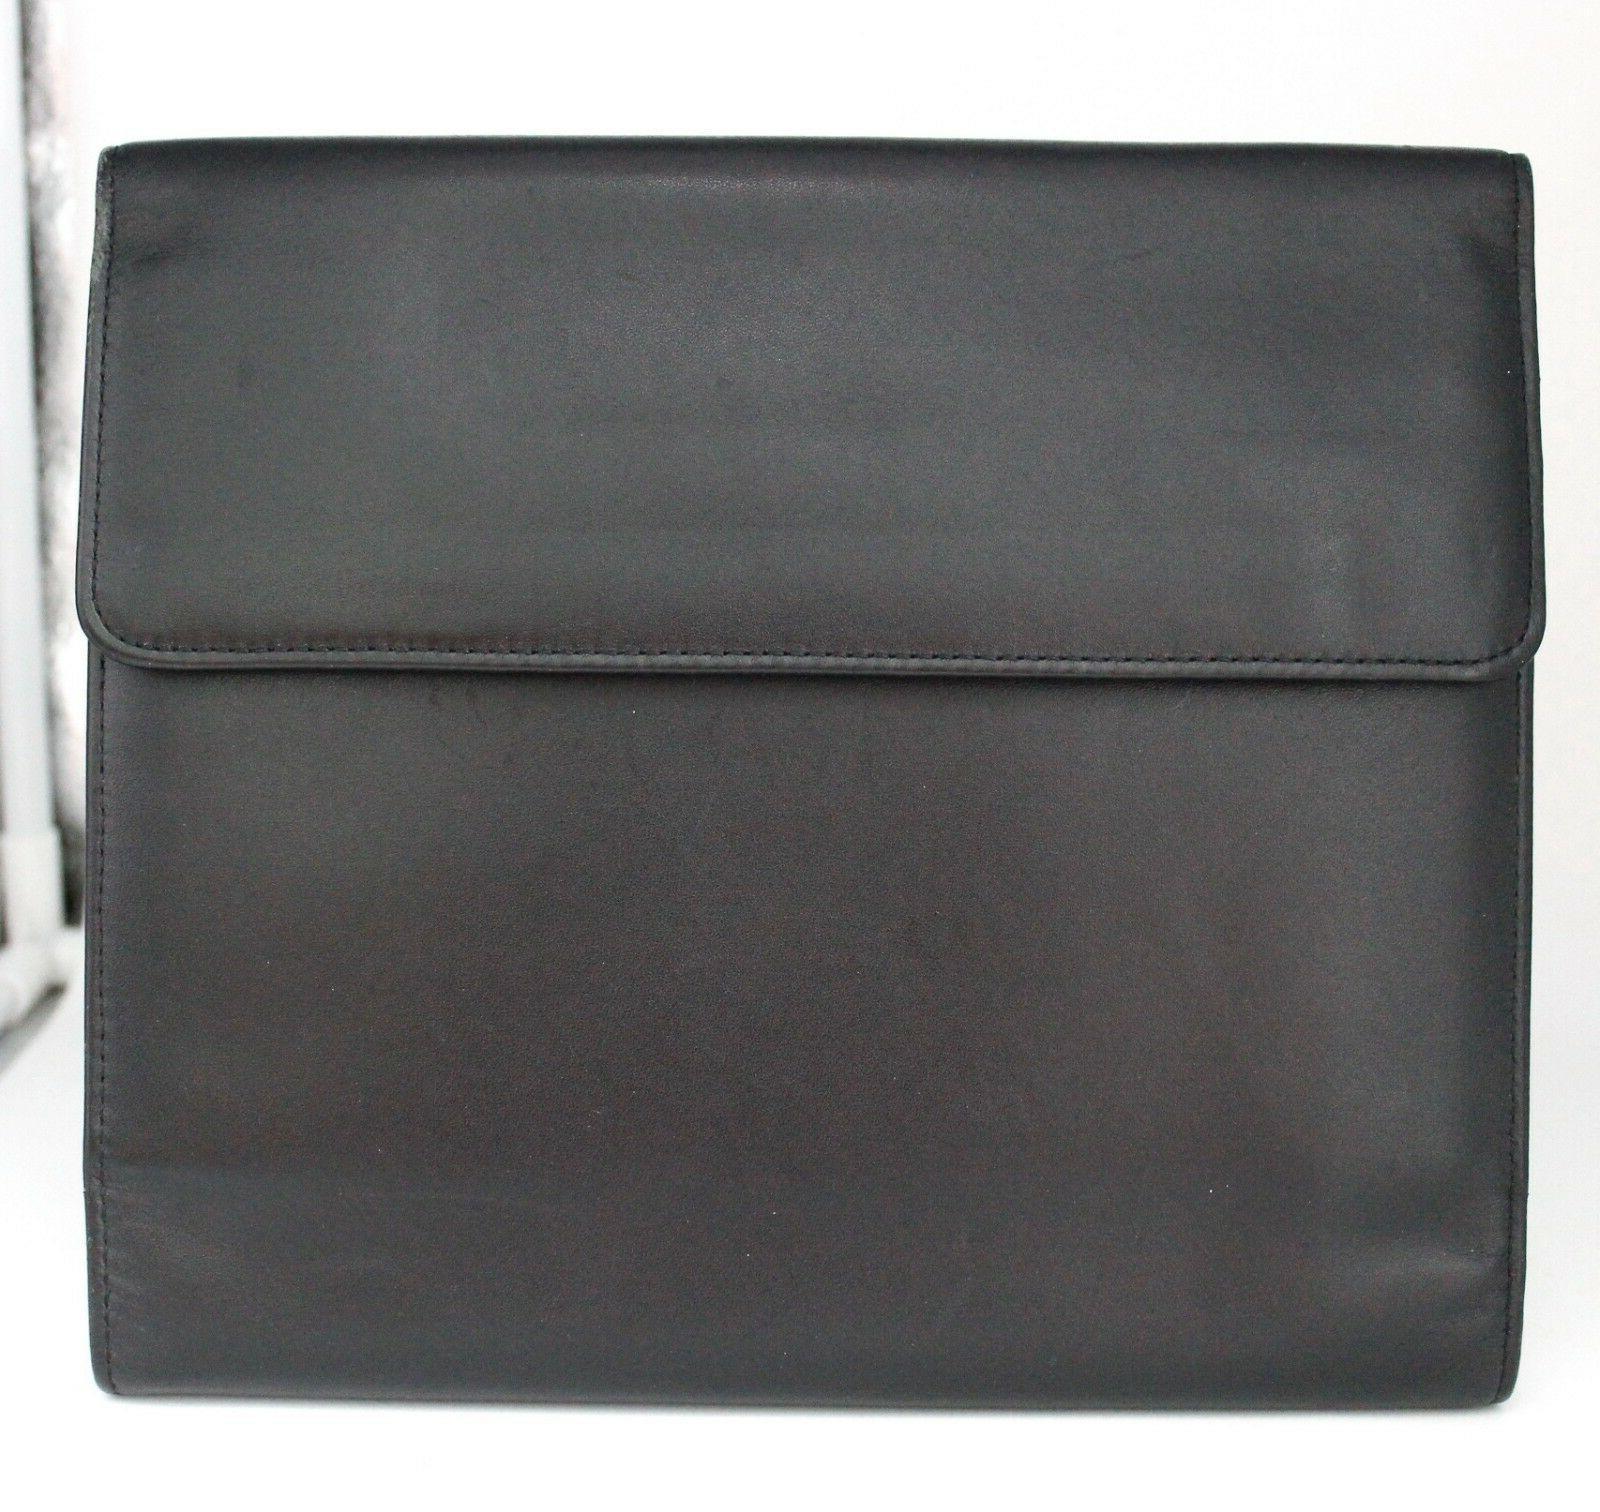 soft black leather card coupon holder